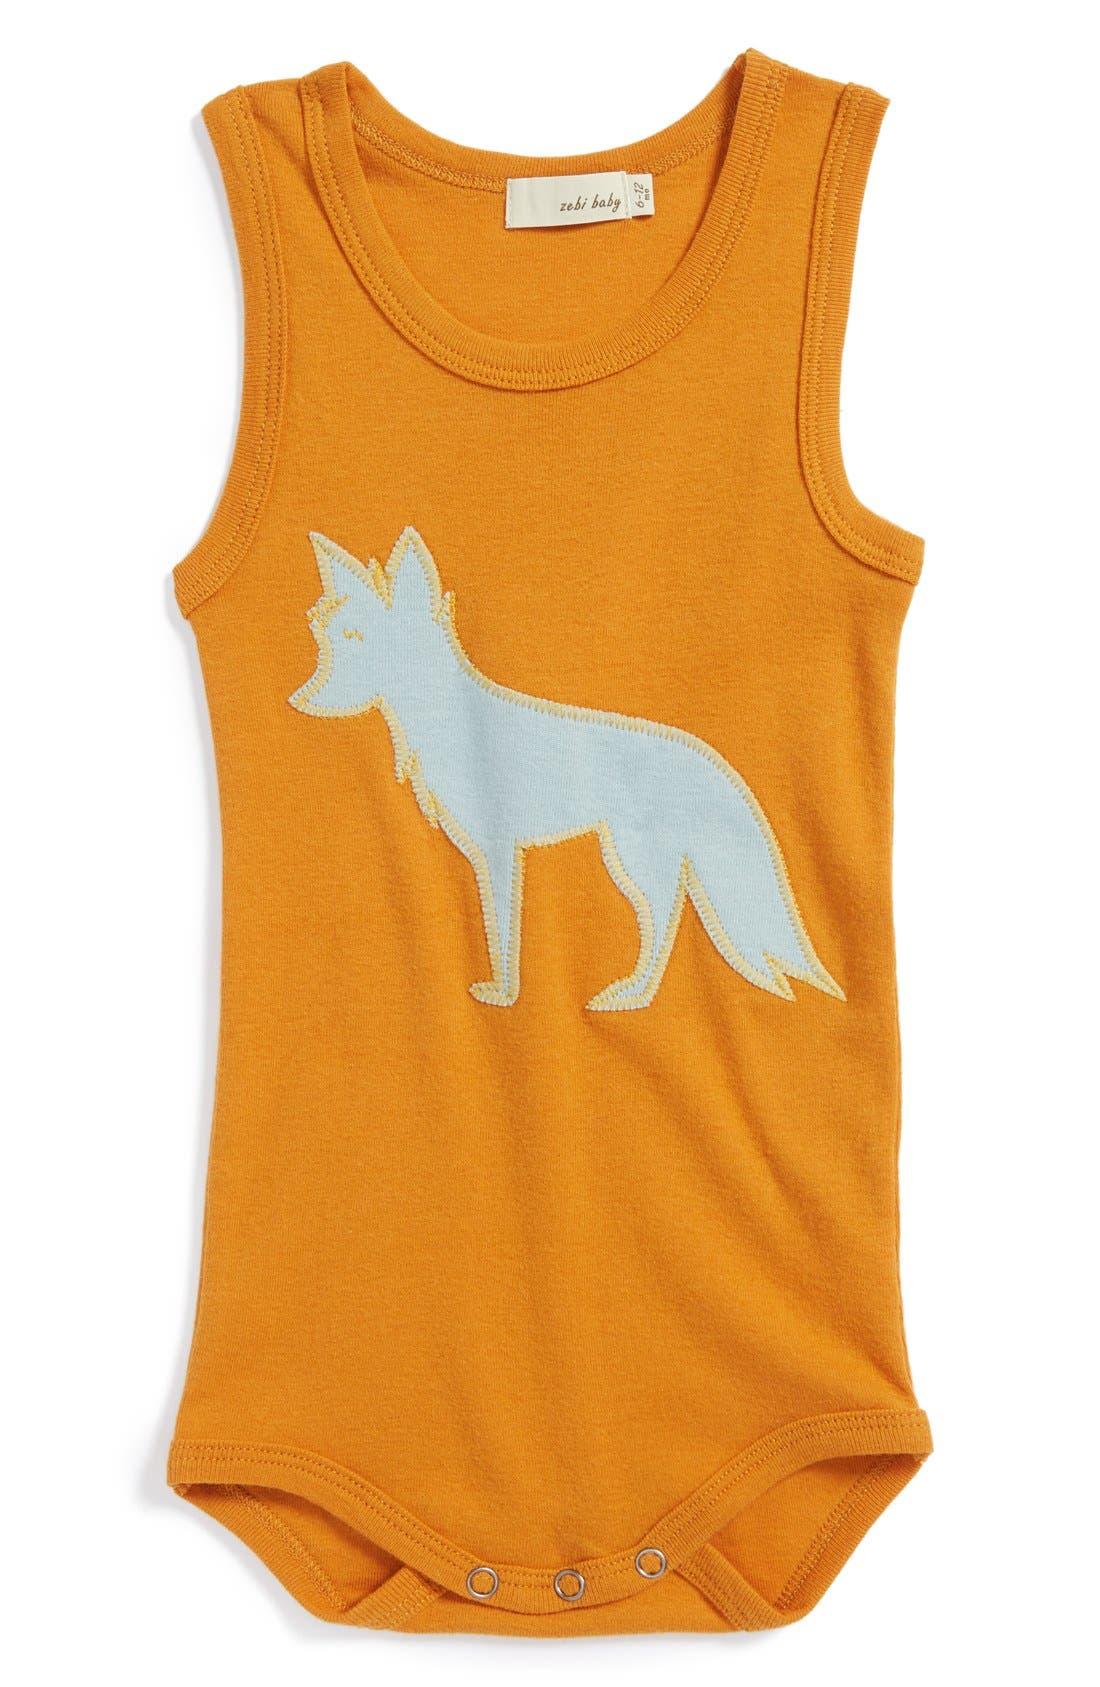 Zebi Baby 'Fox' Organic Cotton Bodysuit,                             Main thumbnail 1, color,                             800